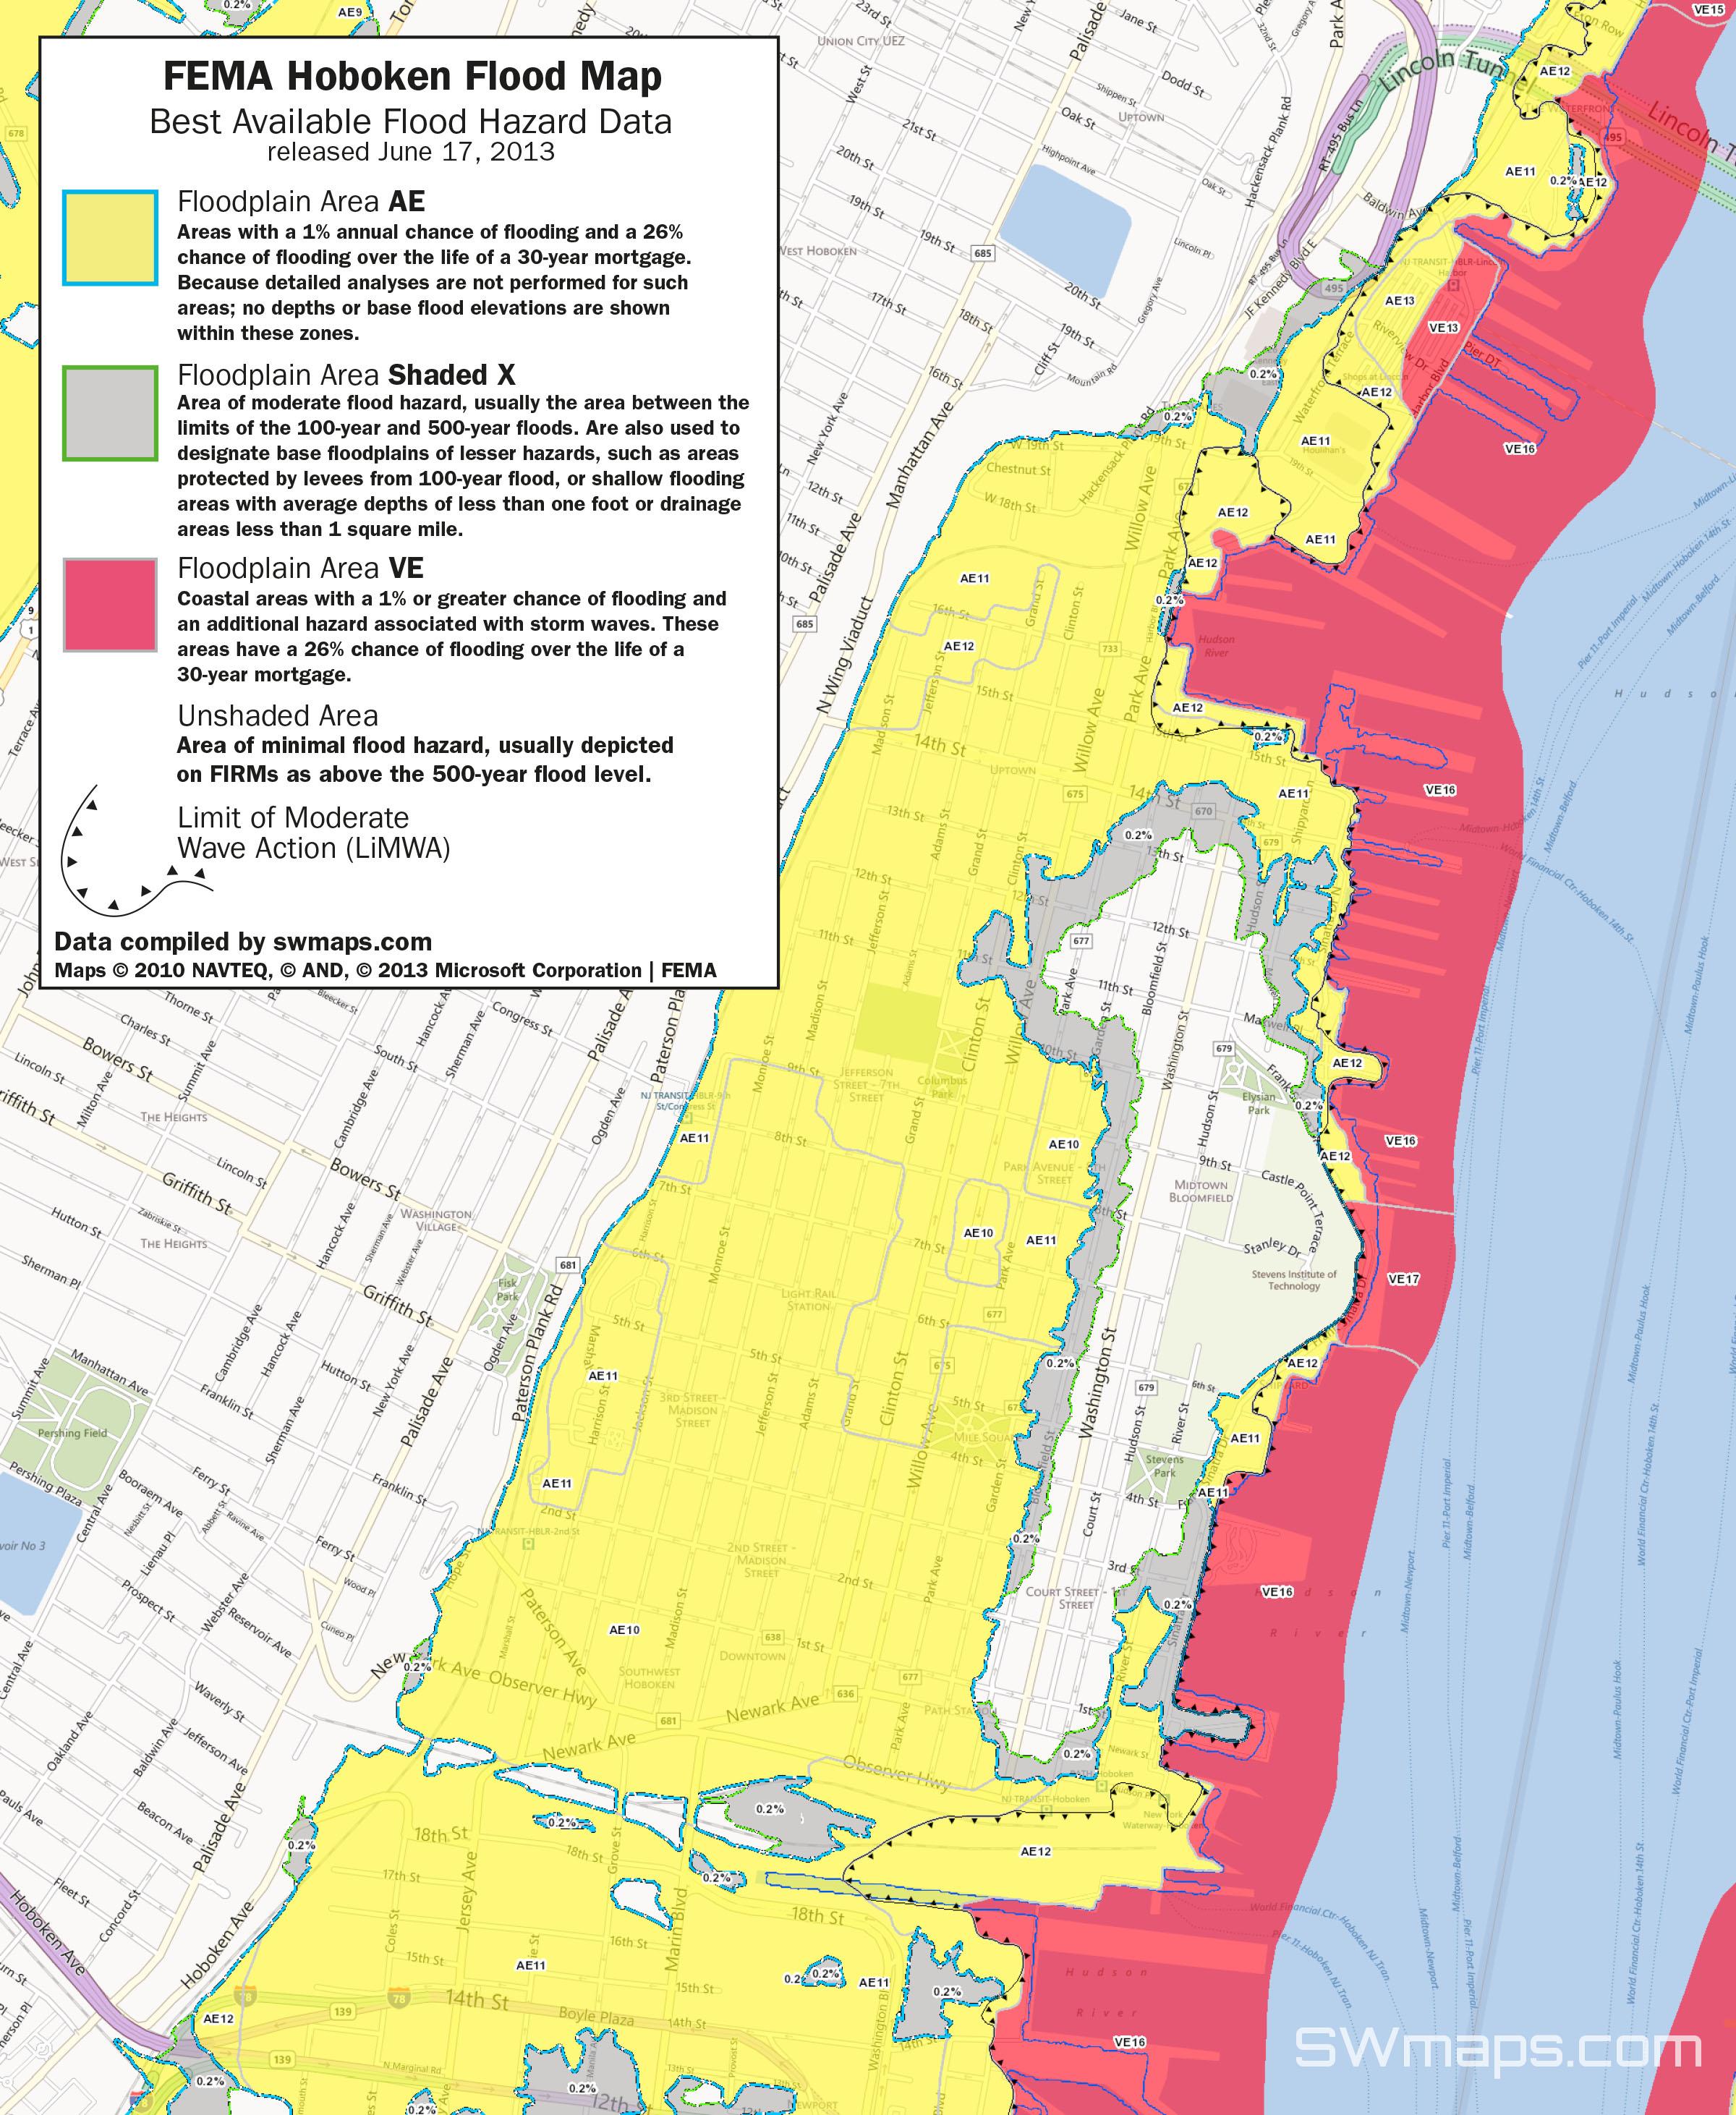 New Hoboken Flood Map: Fema Best Available Flood Hazard Data - Flood Insurance Rate Map Florida